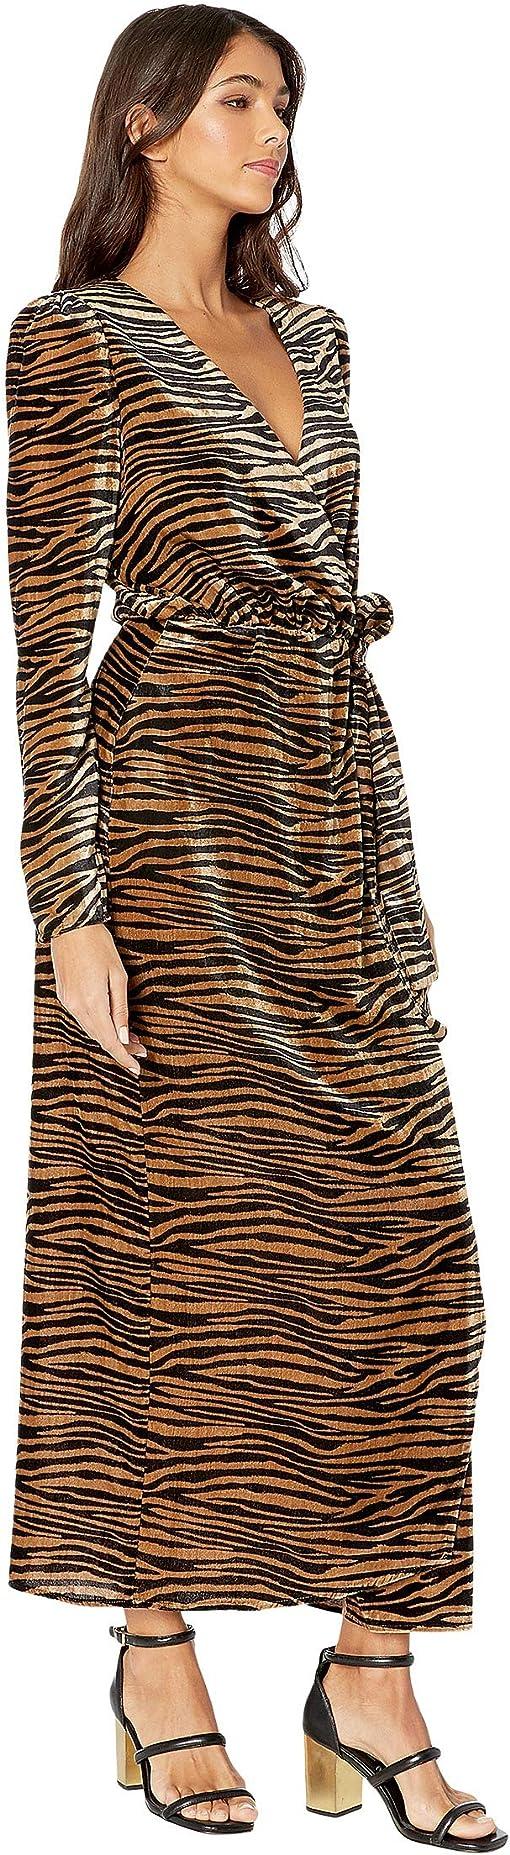 Black/Camel Tiger Velvet